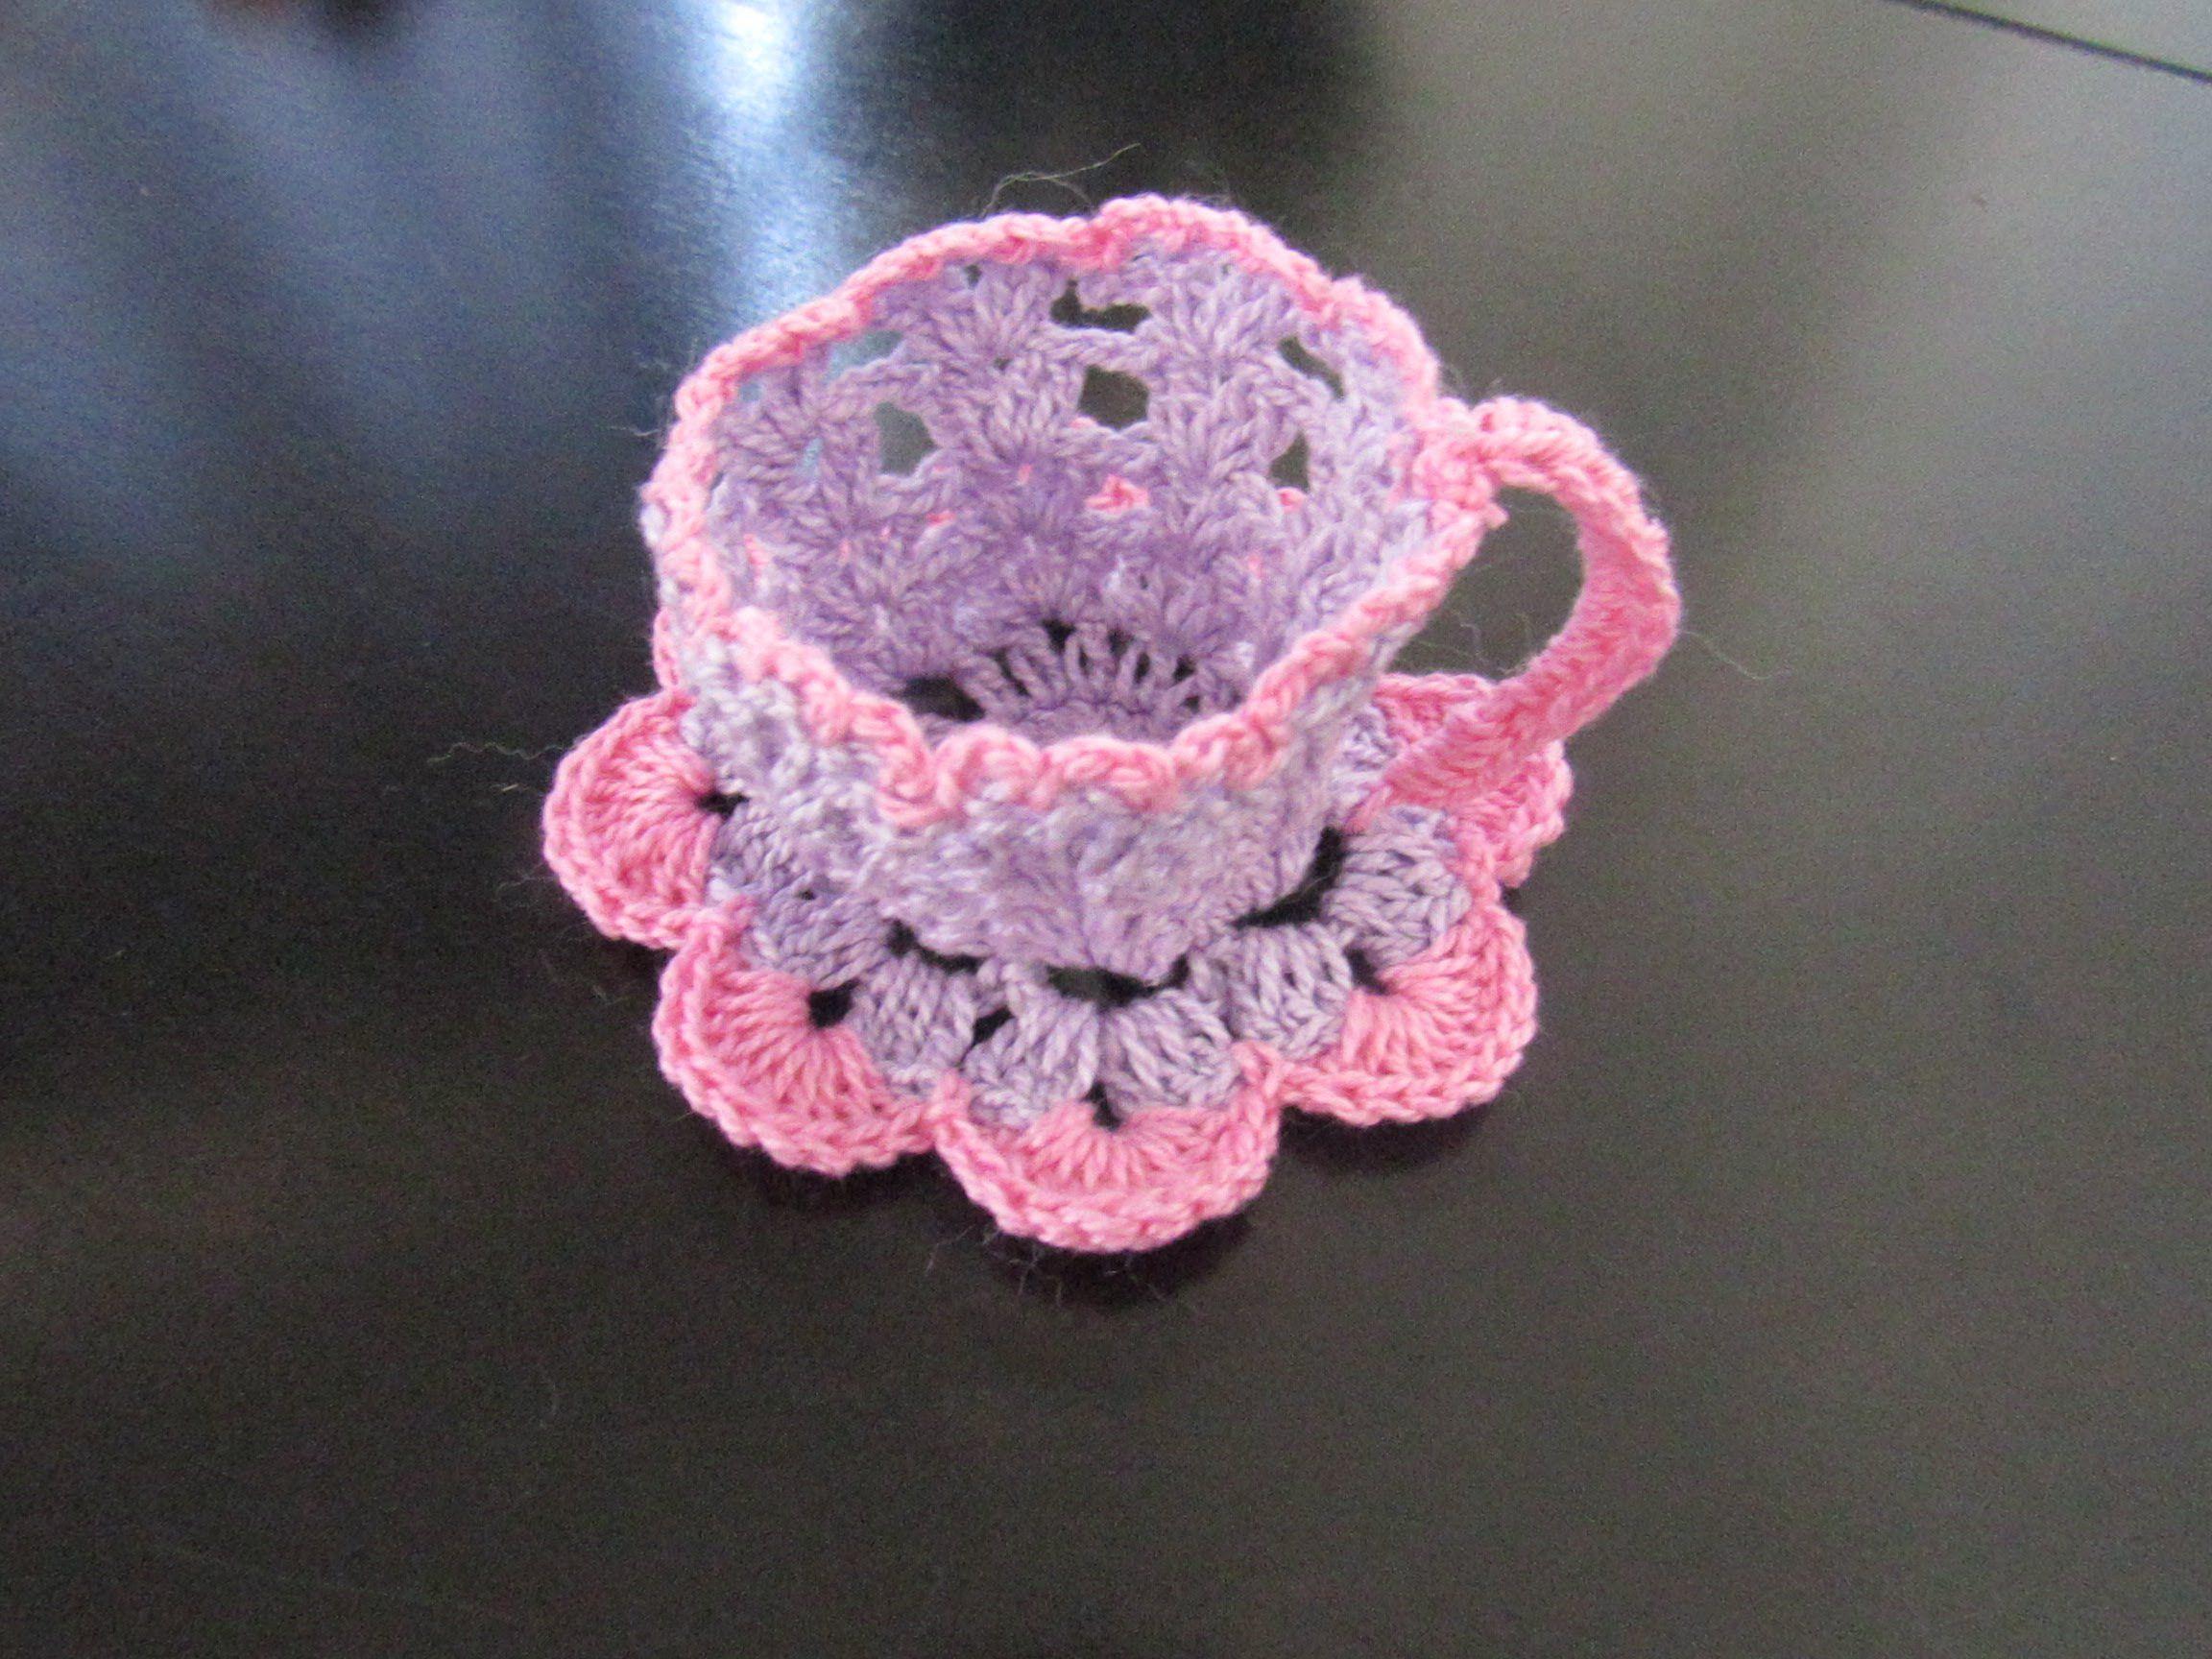 Amigurumi Vivi Free Patterns : Passo a passo xícara de crochê vivi pinterest crochet